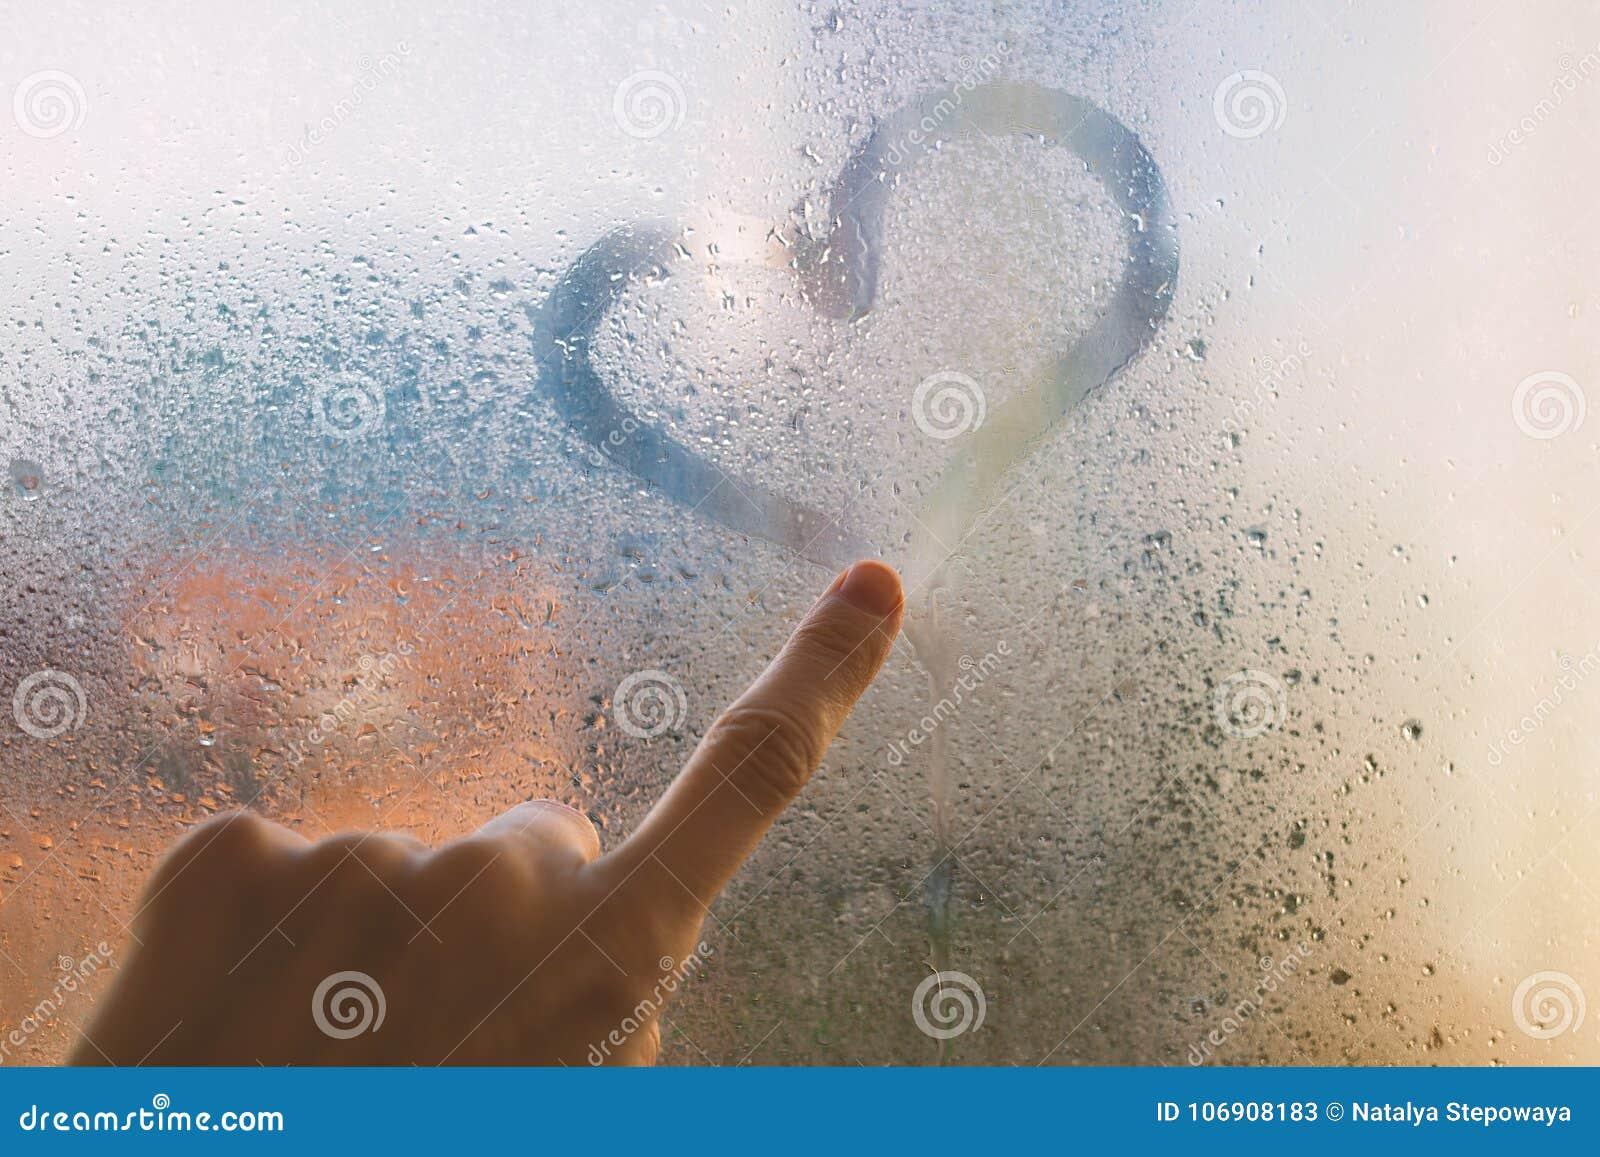 Palec na mokrym szkle rysuje serce